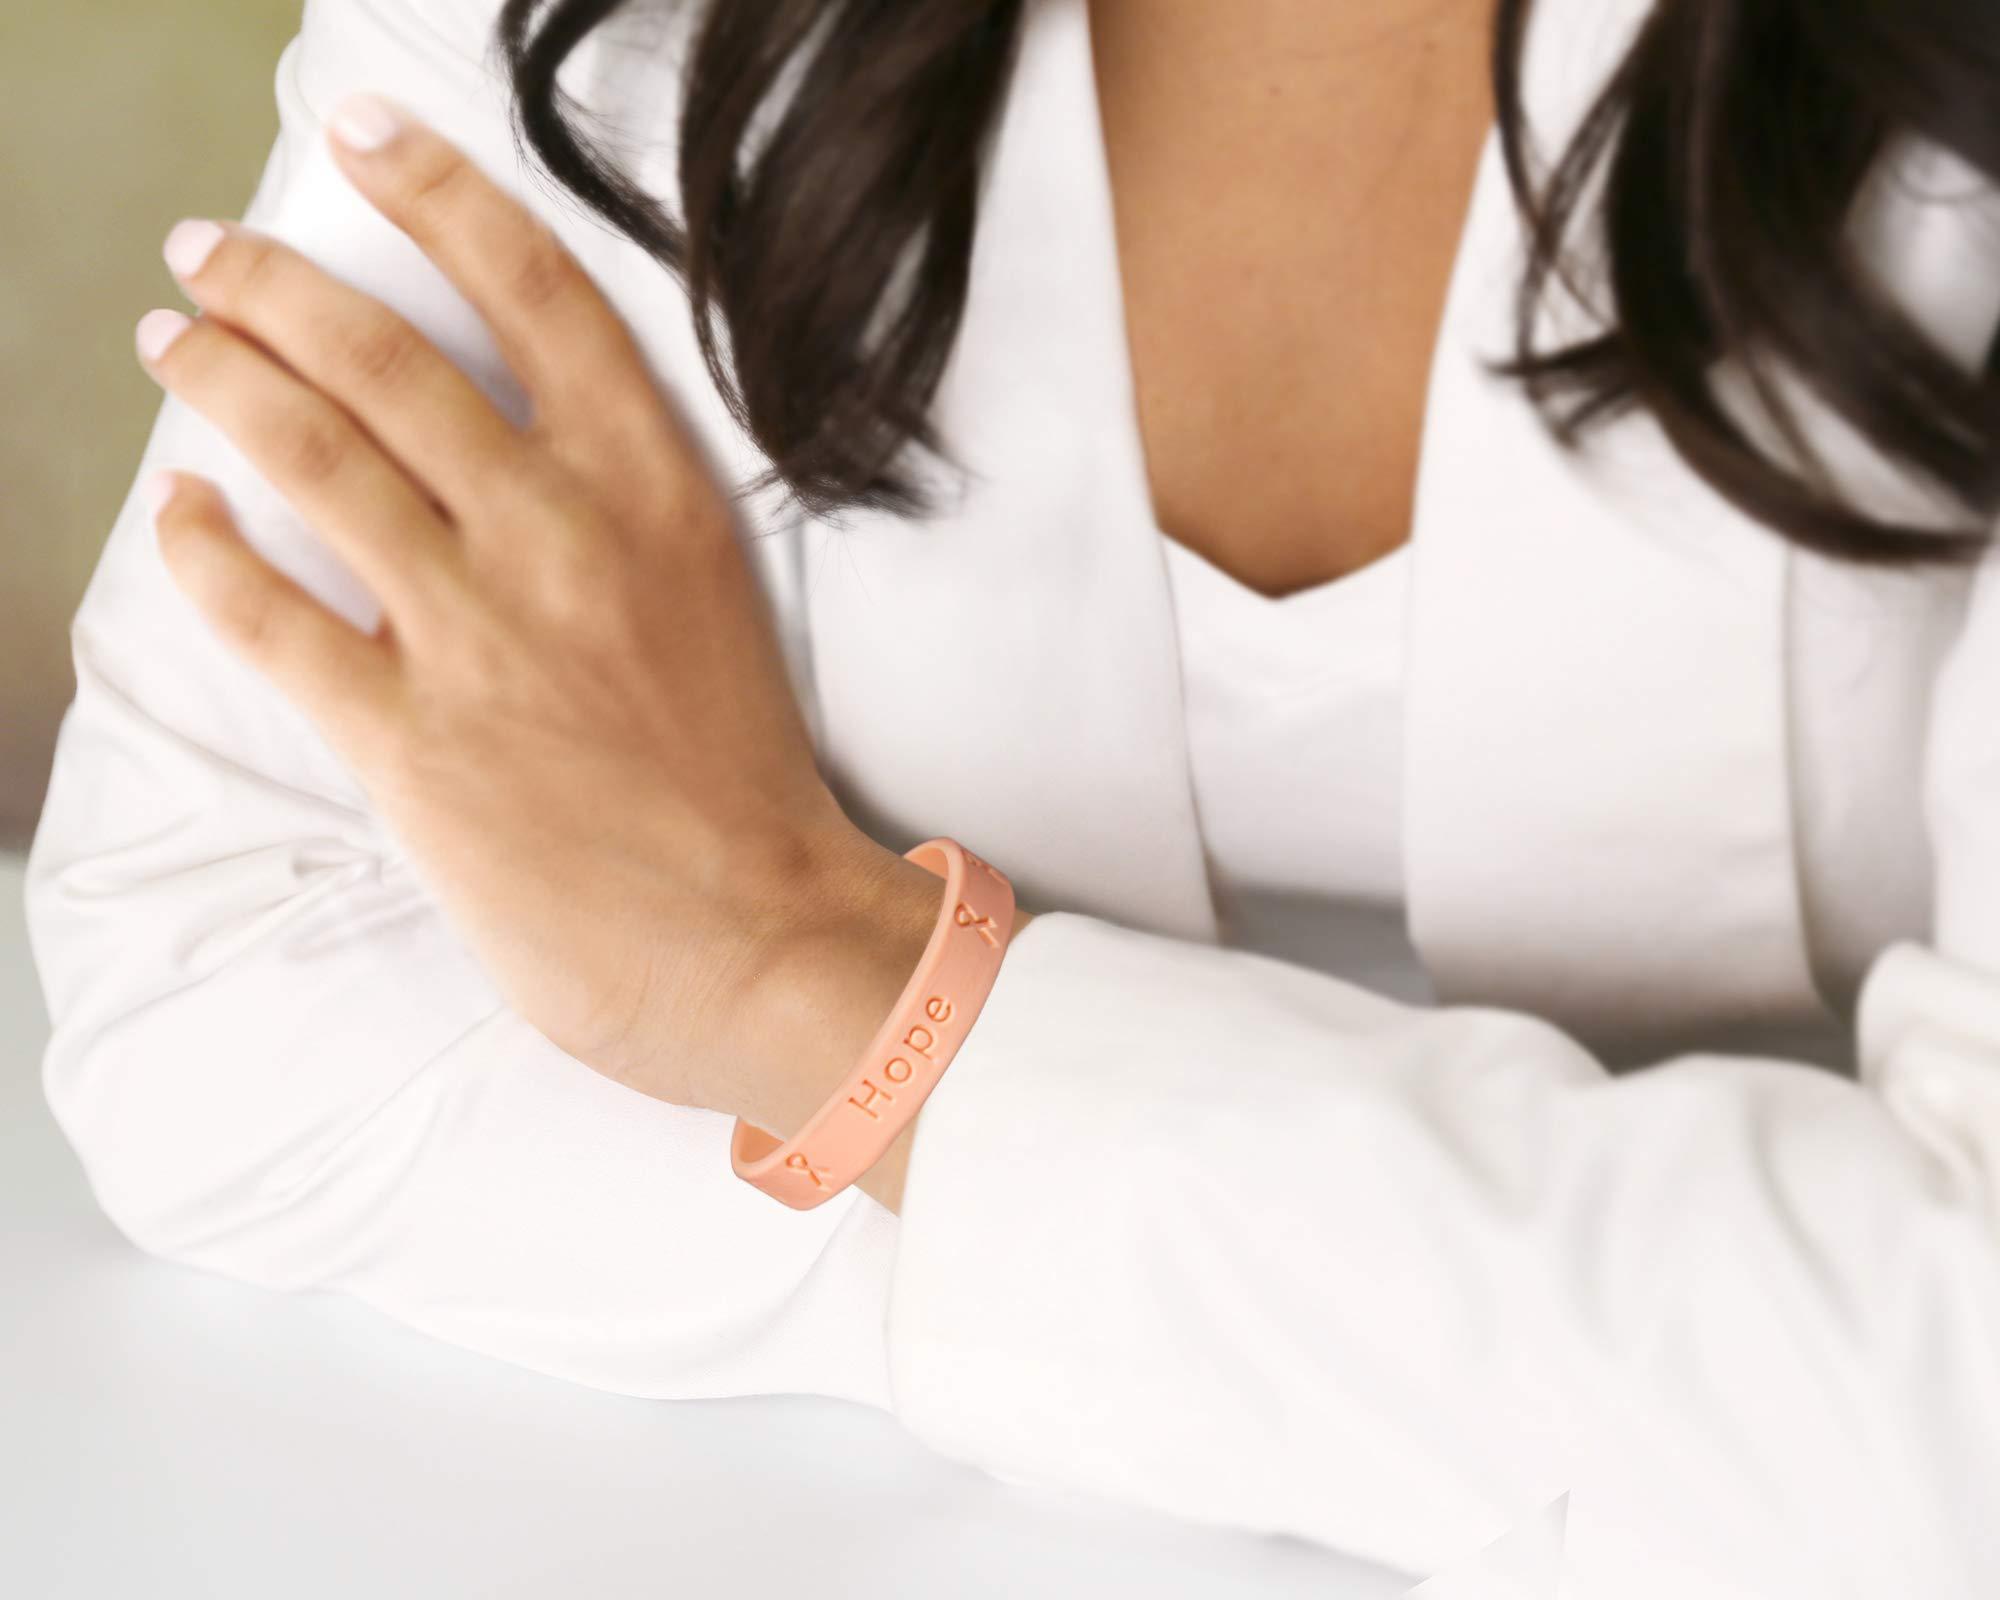 50 Pack Peach Awareness Silicone Bracelets (Wholesale Pack - 50 Bracelets)